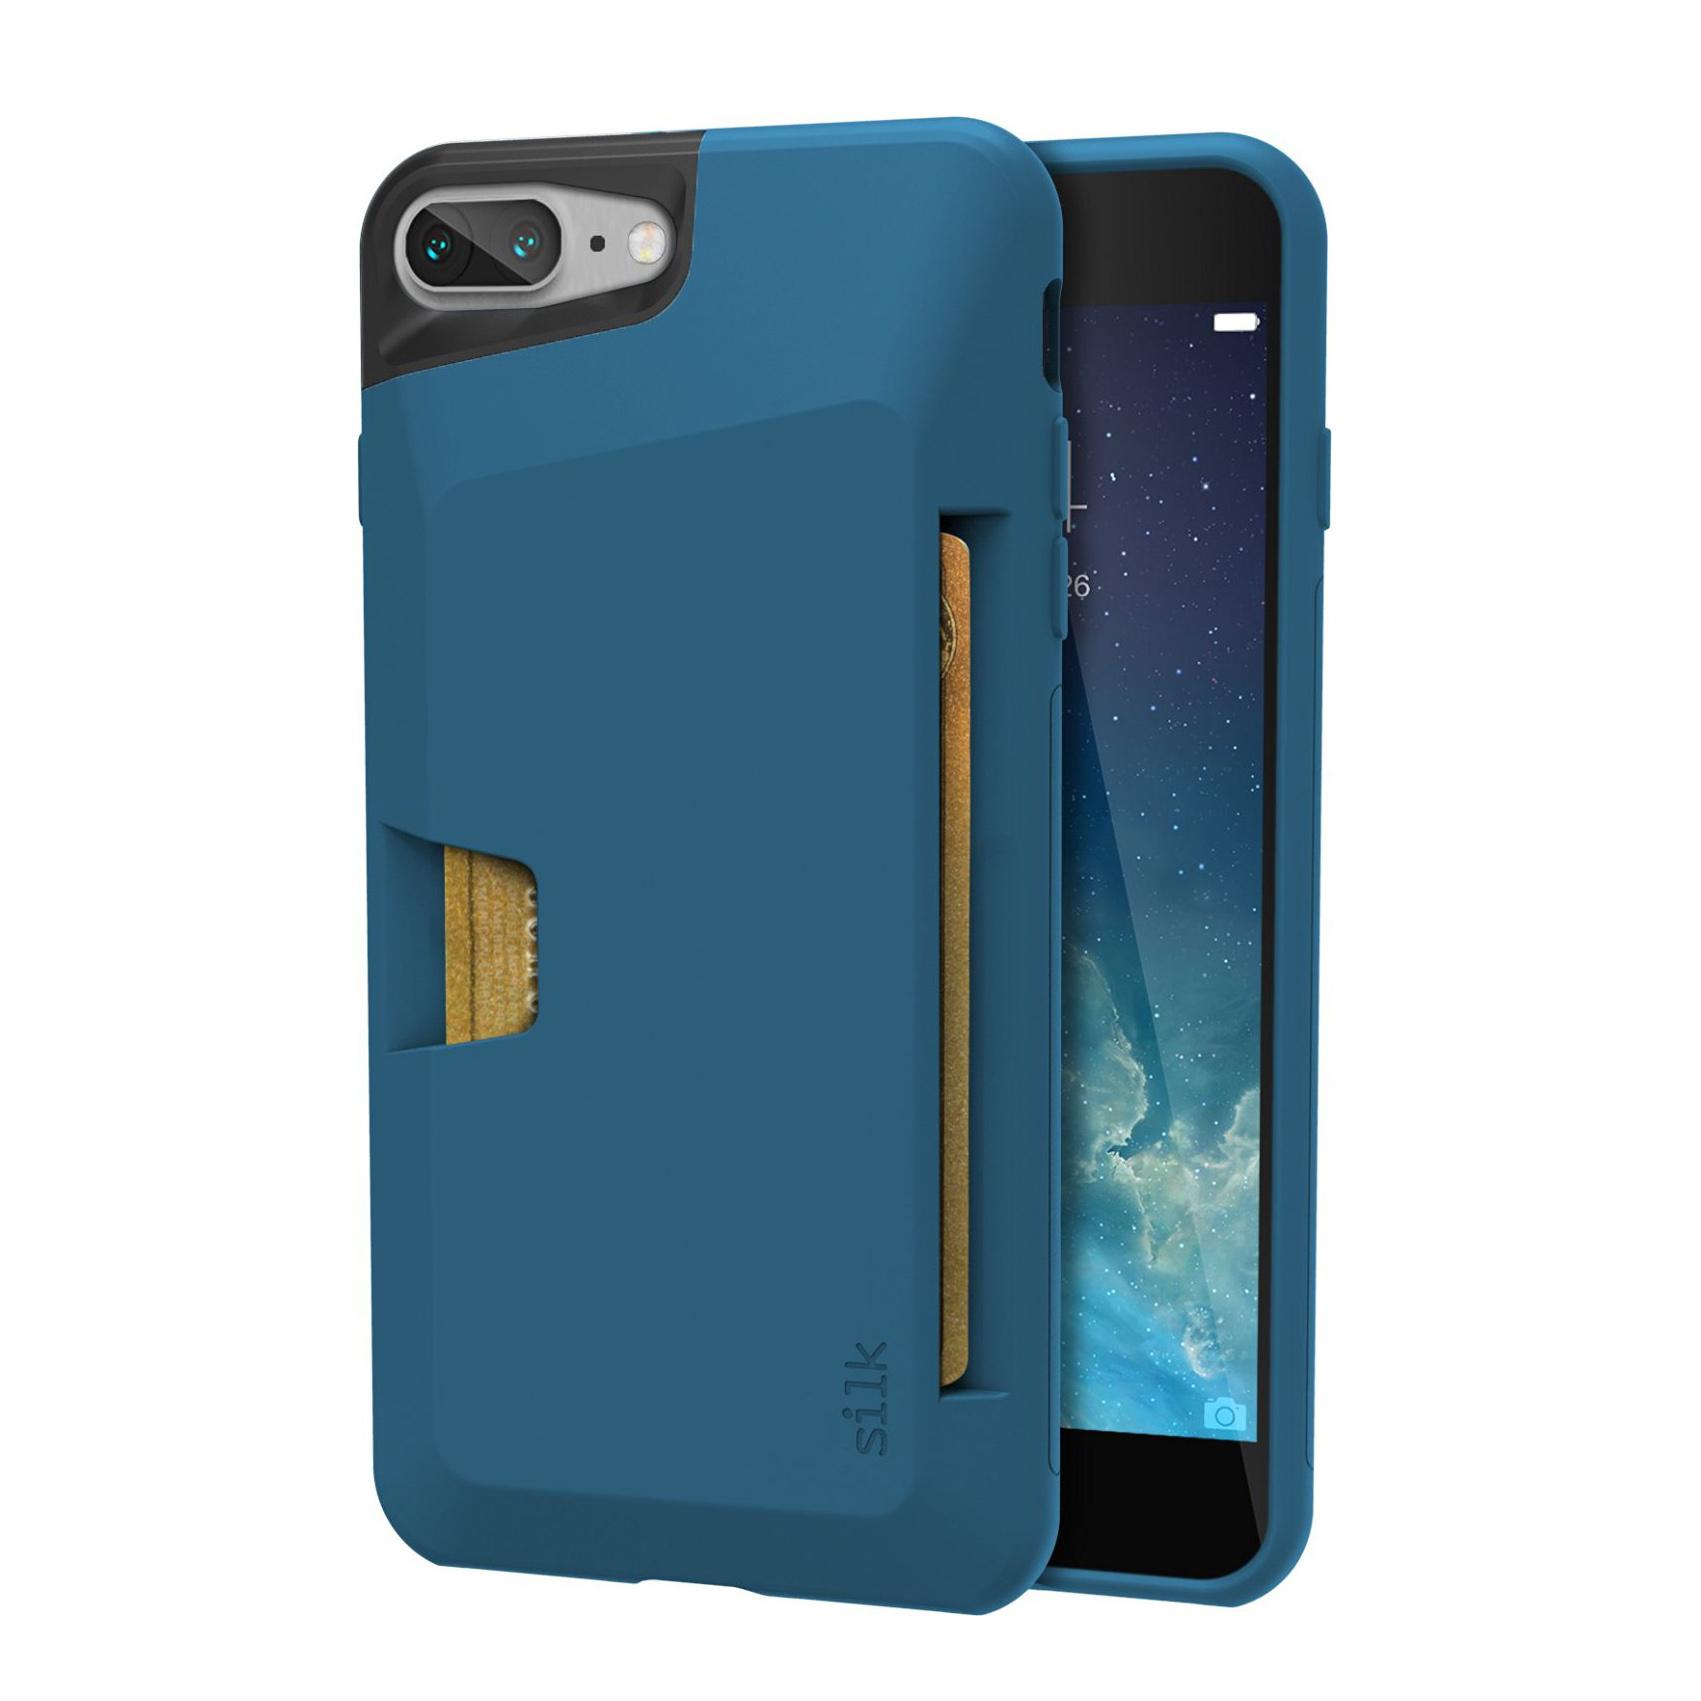 reputable site 0b8ff c7dfe [Hot Item] Vault Slim Silk Wallet Ultra Slim Grip Case for iPhone 7plus